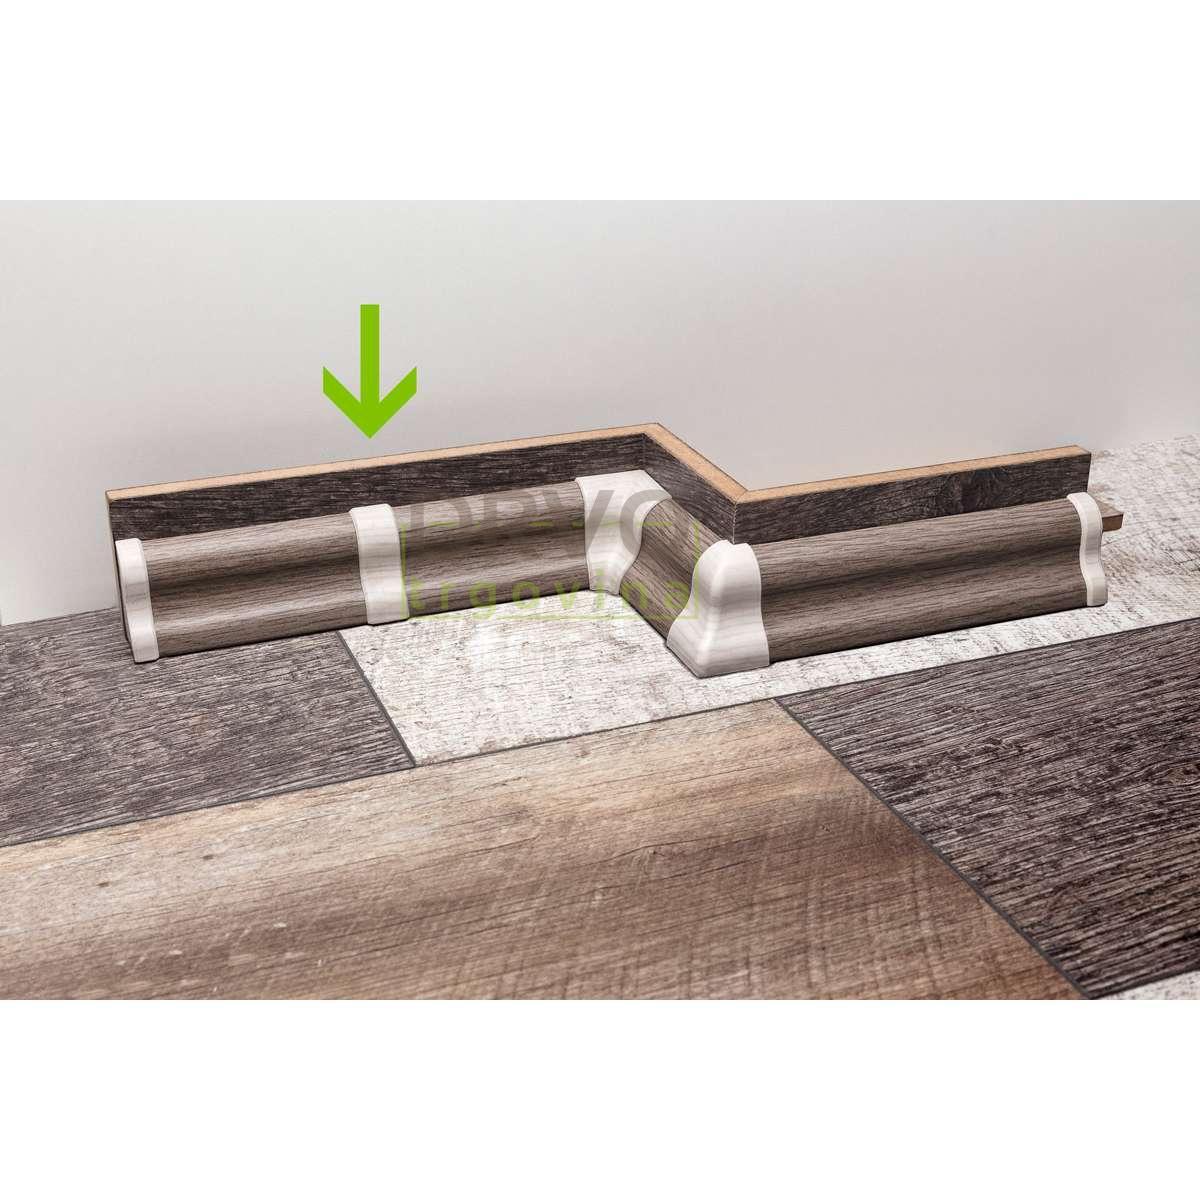 PVC SPOJ ZA LETVICE FOEI MERBAU / ORAH STMA80 708537